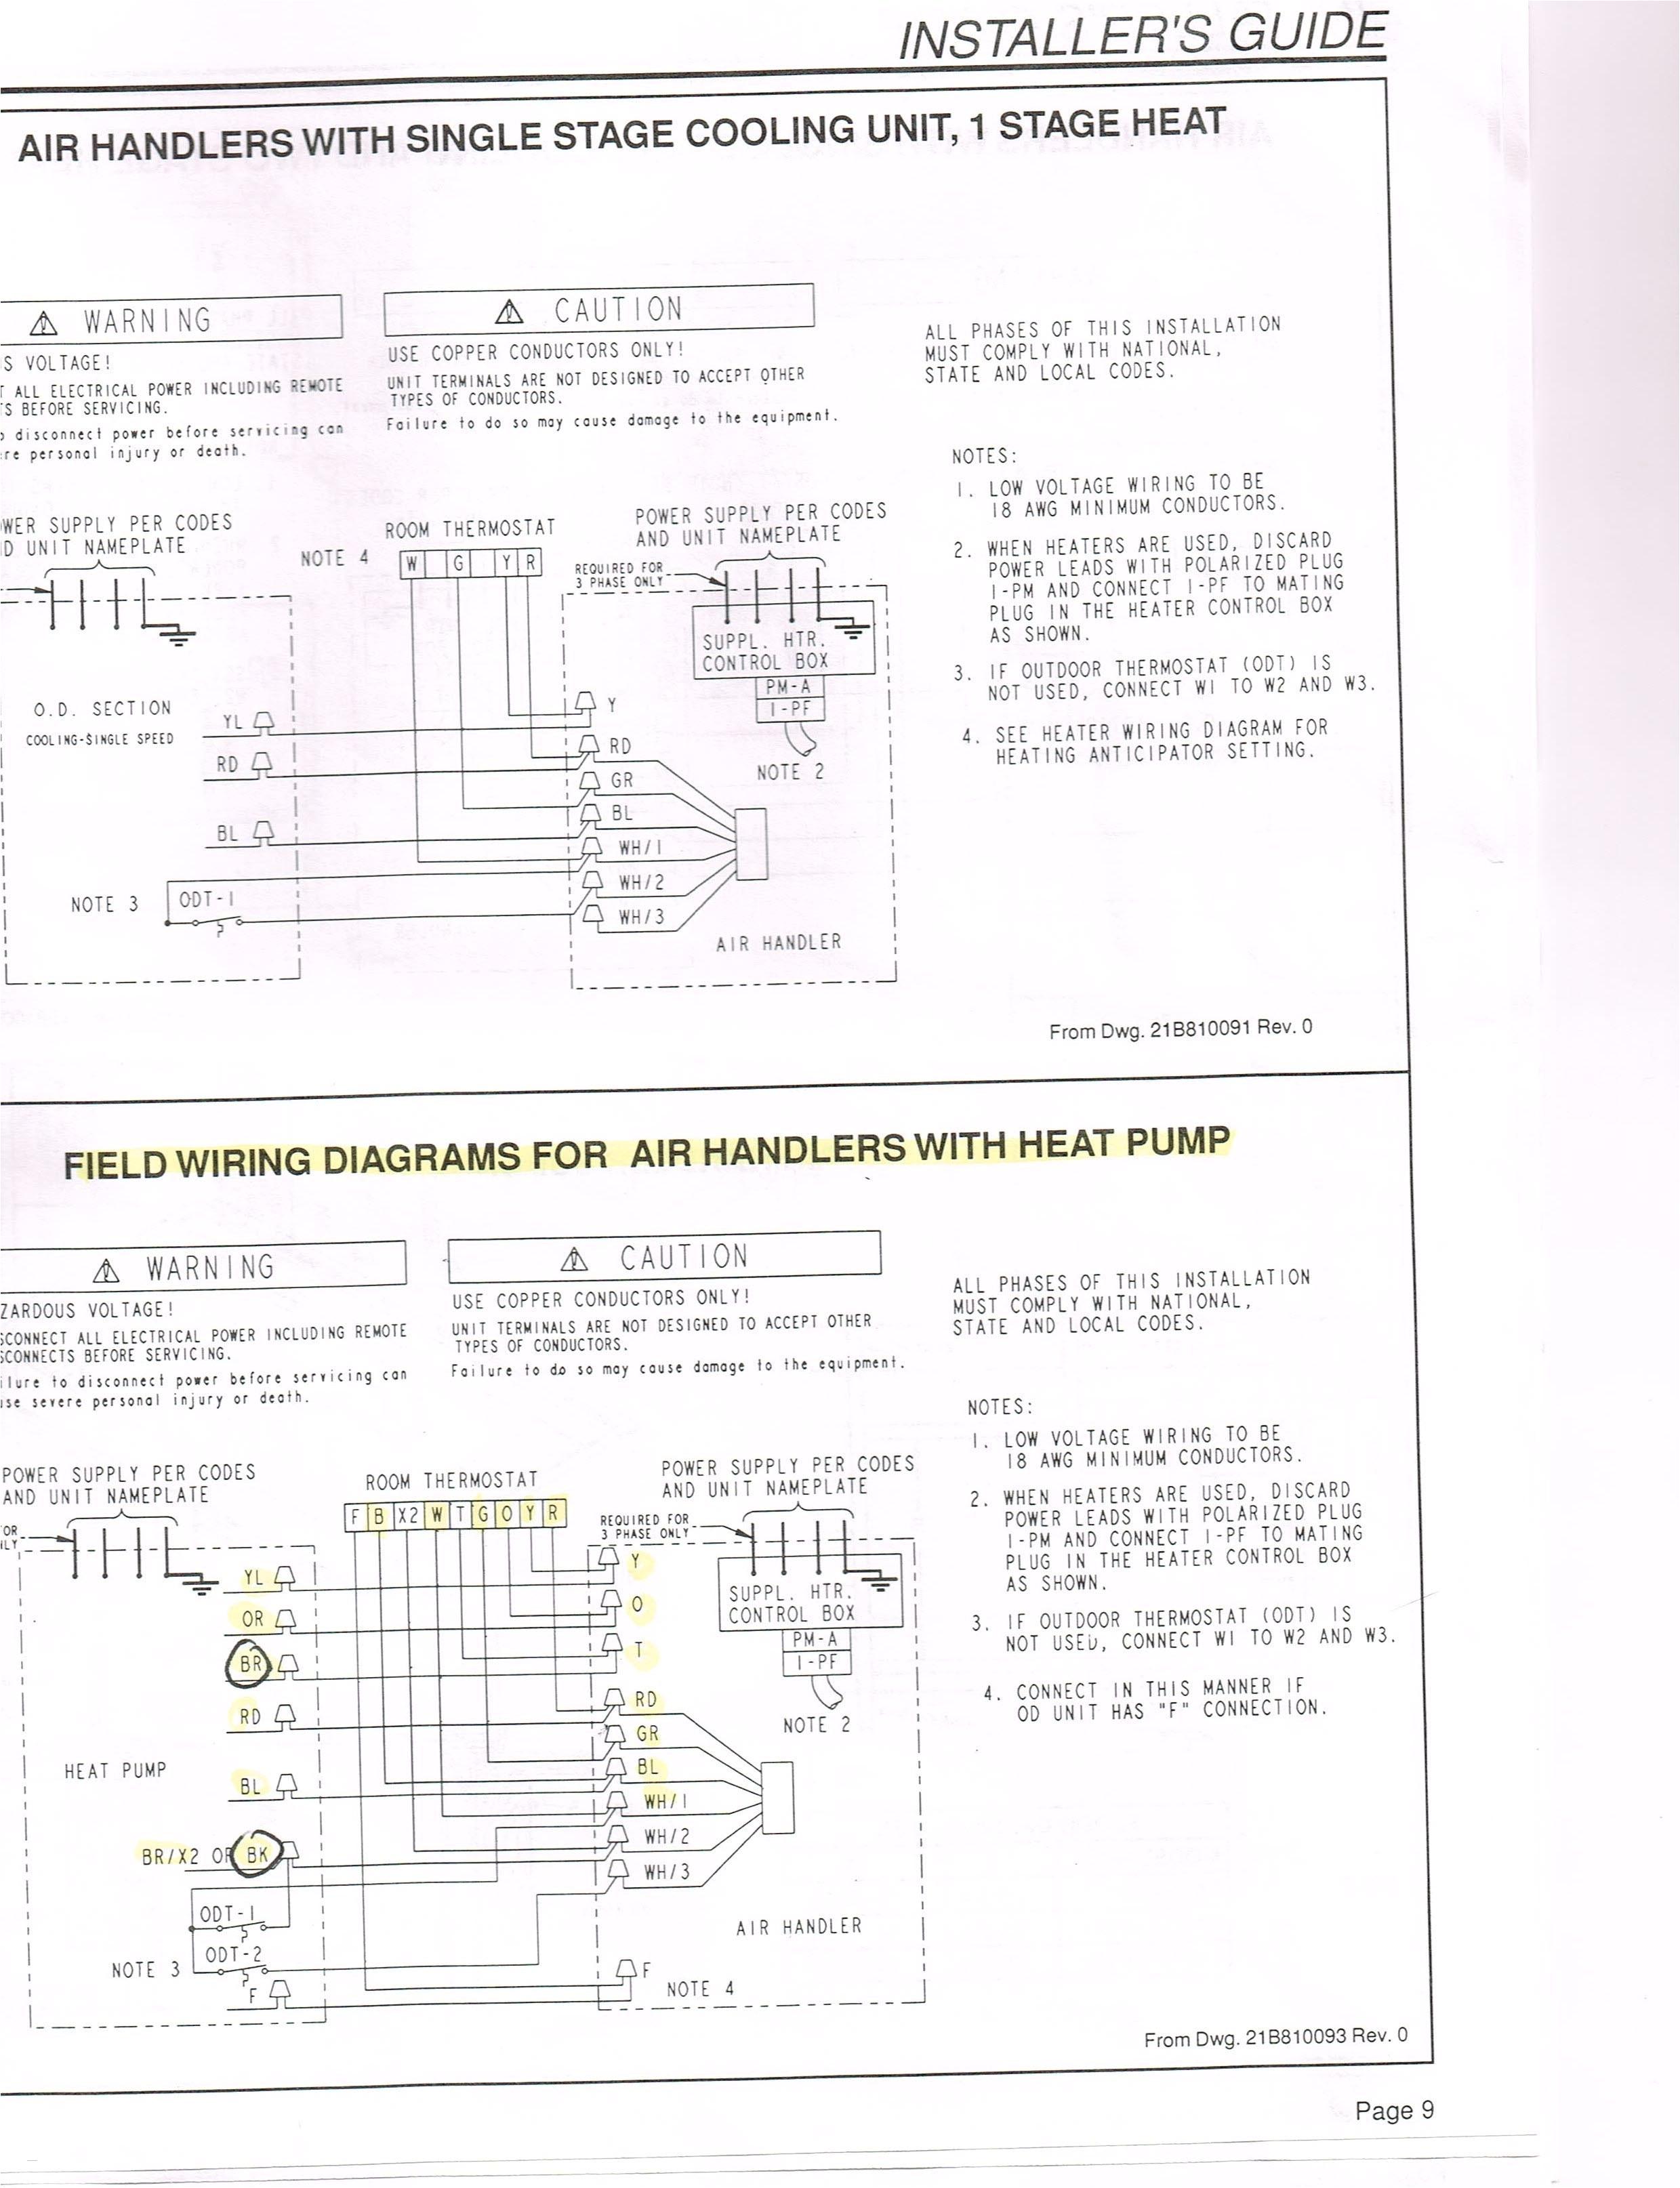 vw type 1 wiring diagram elegant mk5 golf heated seat wiring diagram valid wiring diagram for vw golf jpg